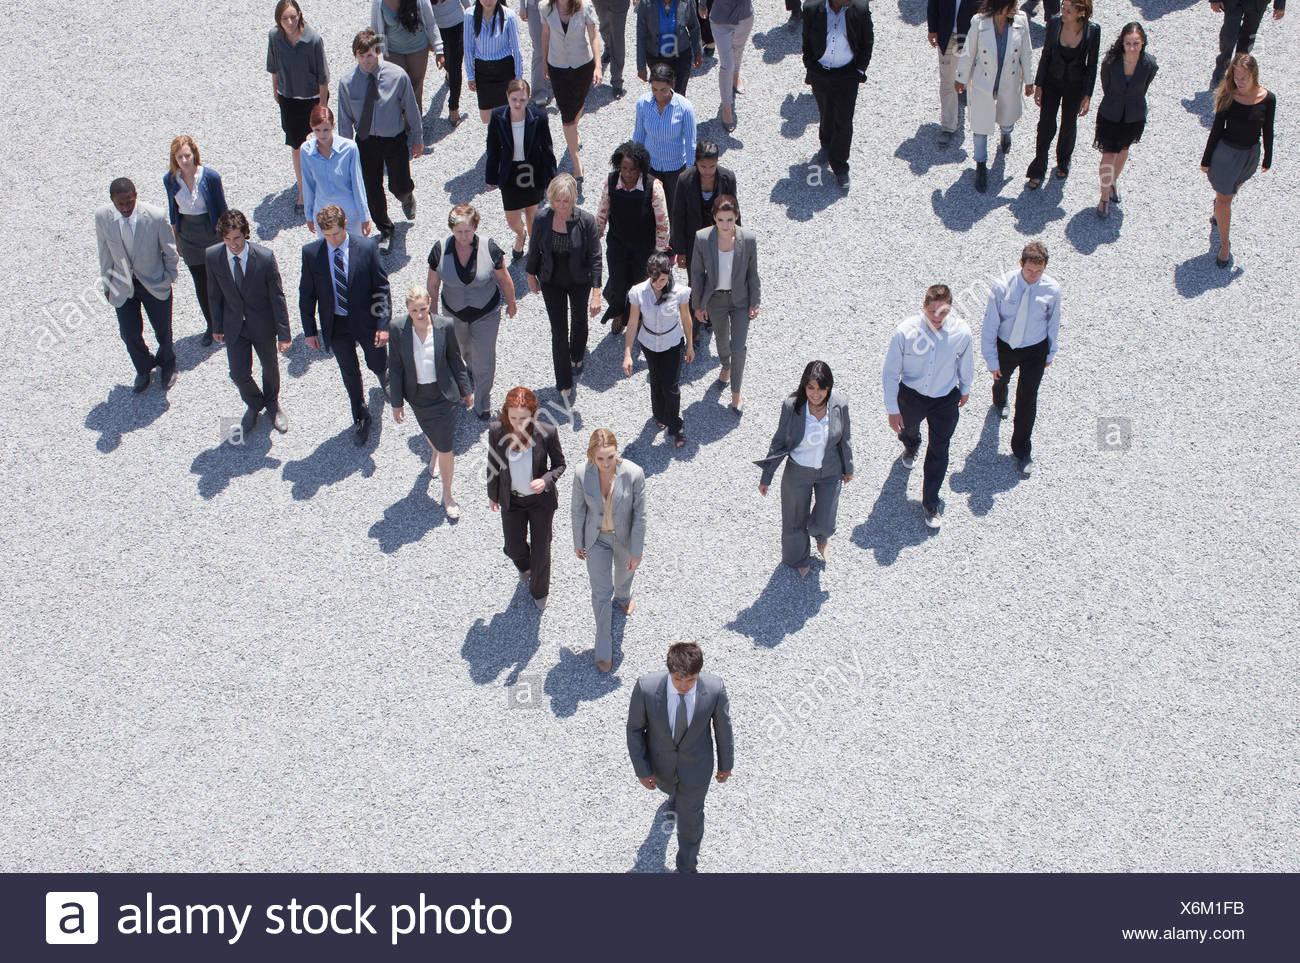 Business people walking - Stock Image